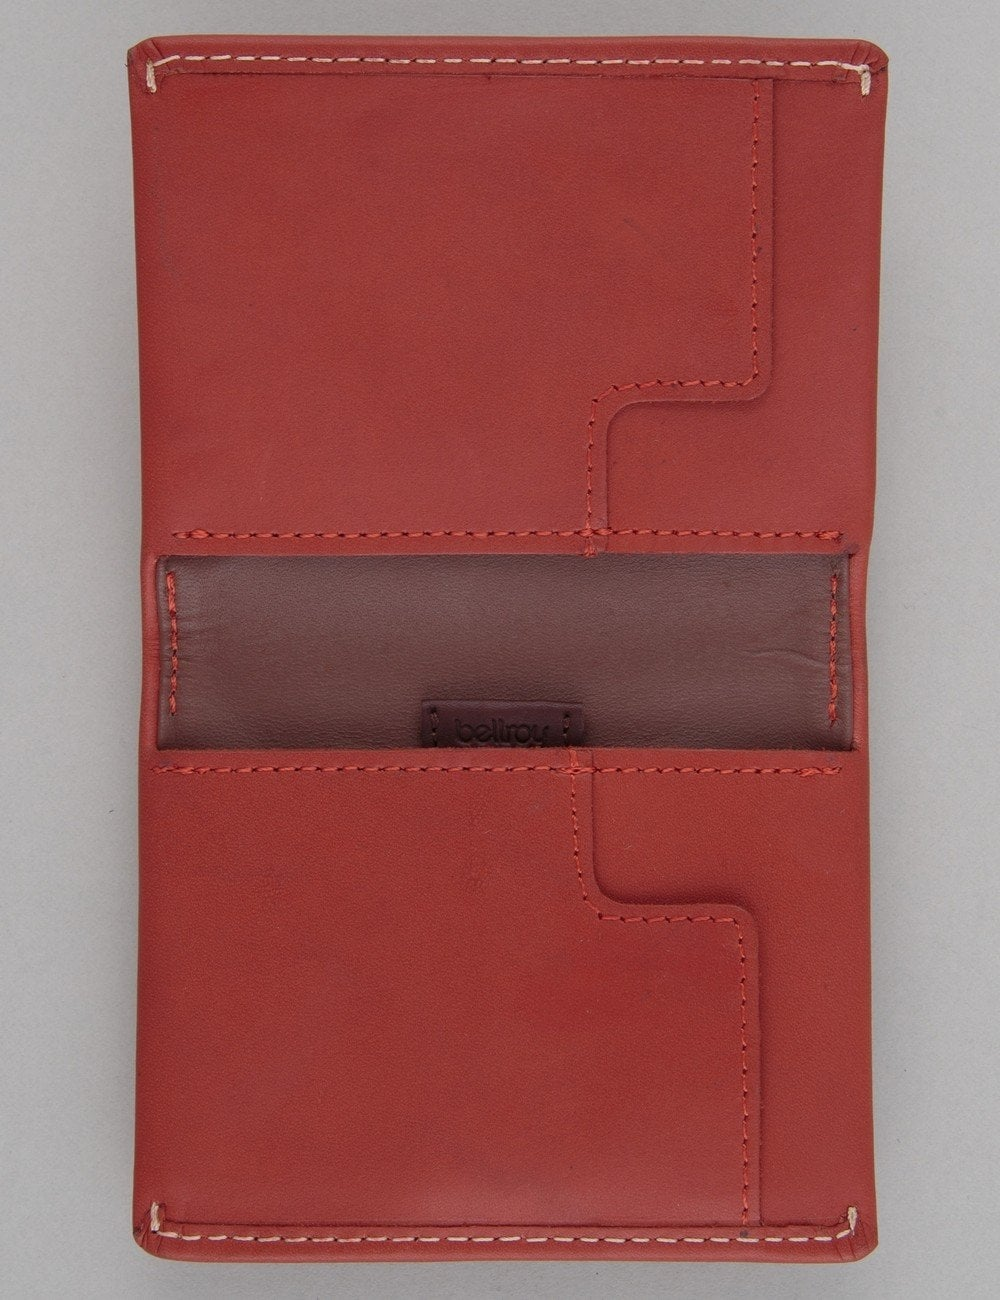 a2f0bca265 Slim Sleeve Wallet - Tamarillo